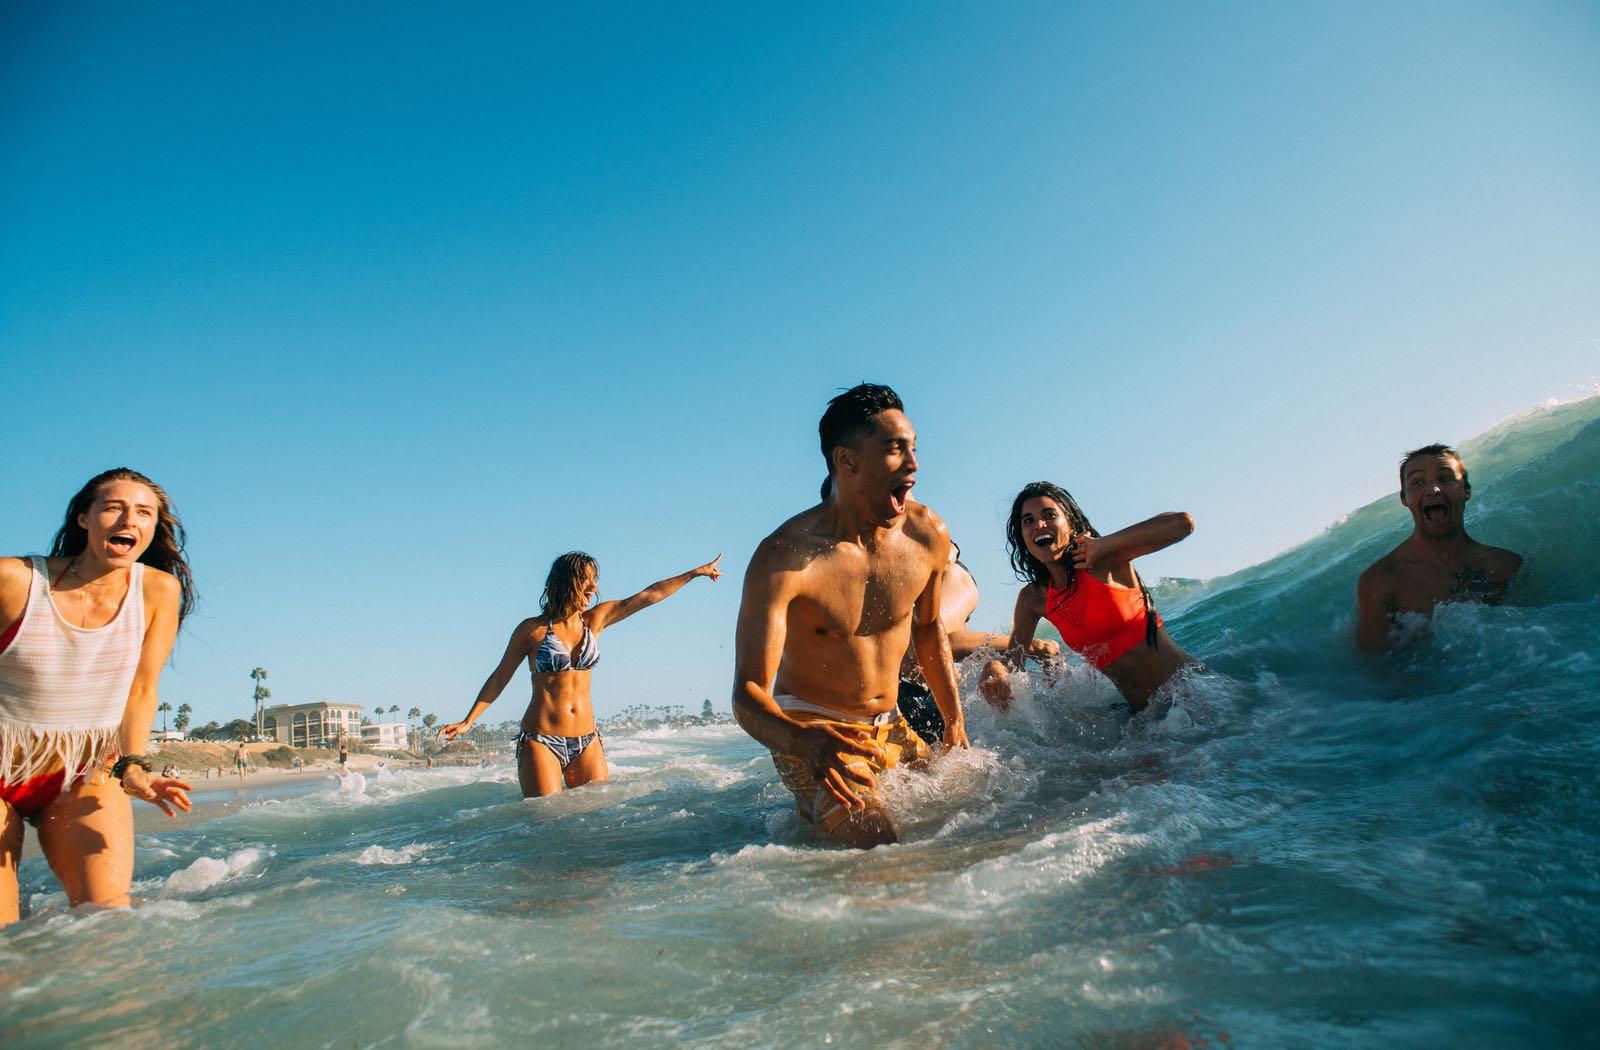 Beach Fun - Top Things to Do in San Diego